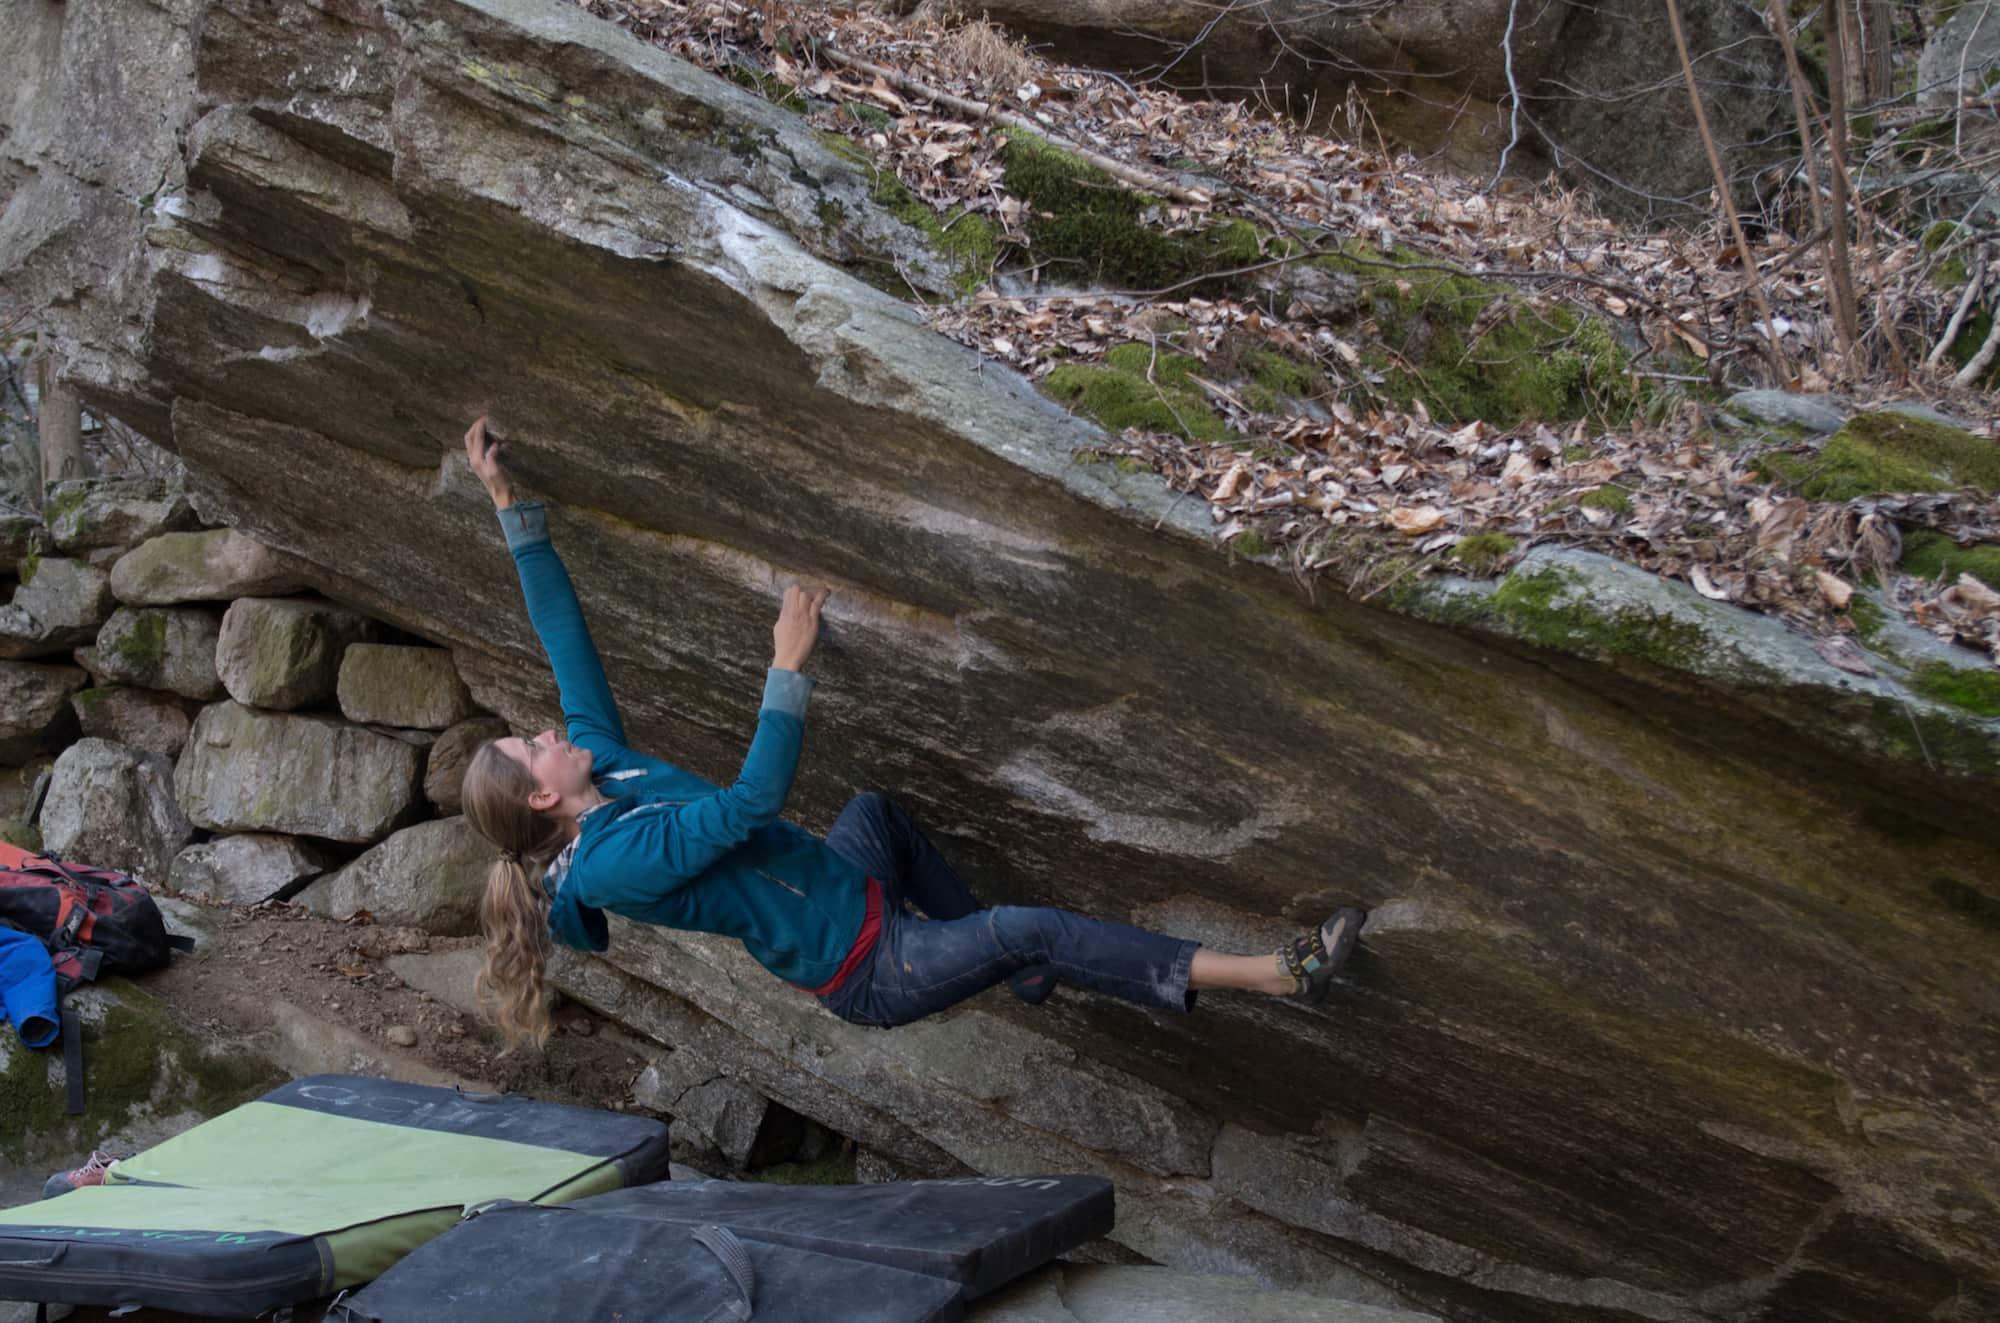 FrictionLabs Athlete Vera Warmbrunn climbing boulder in German